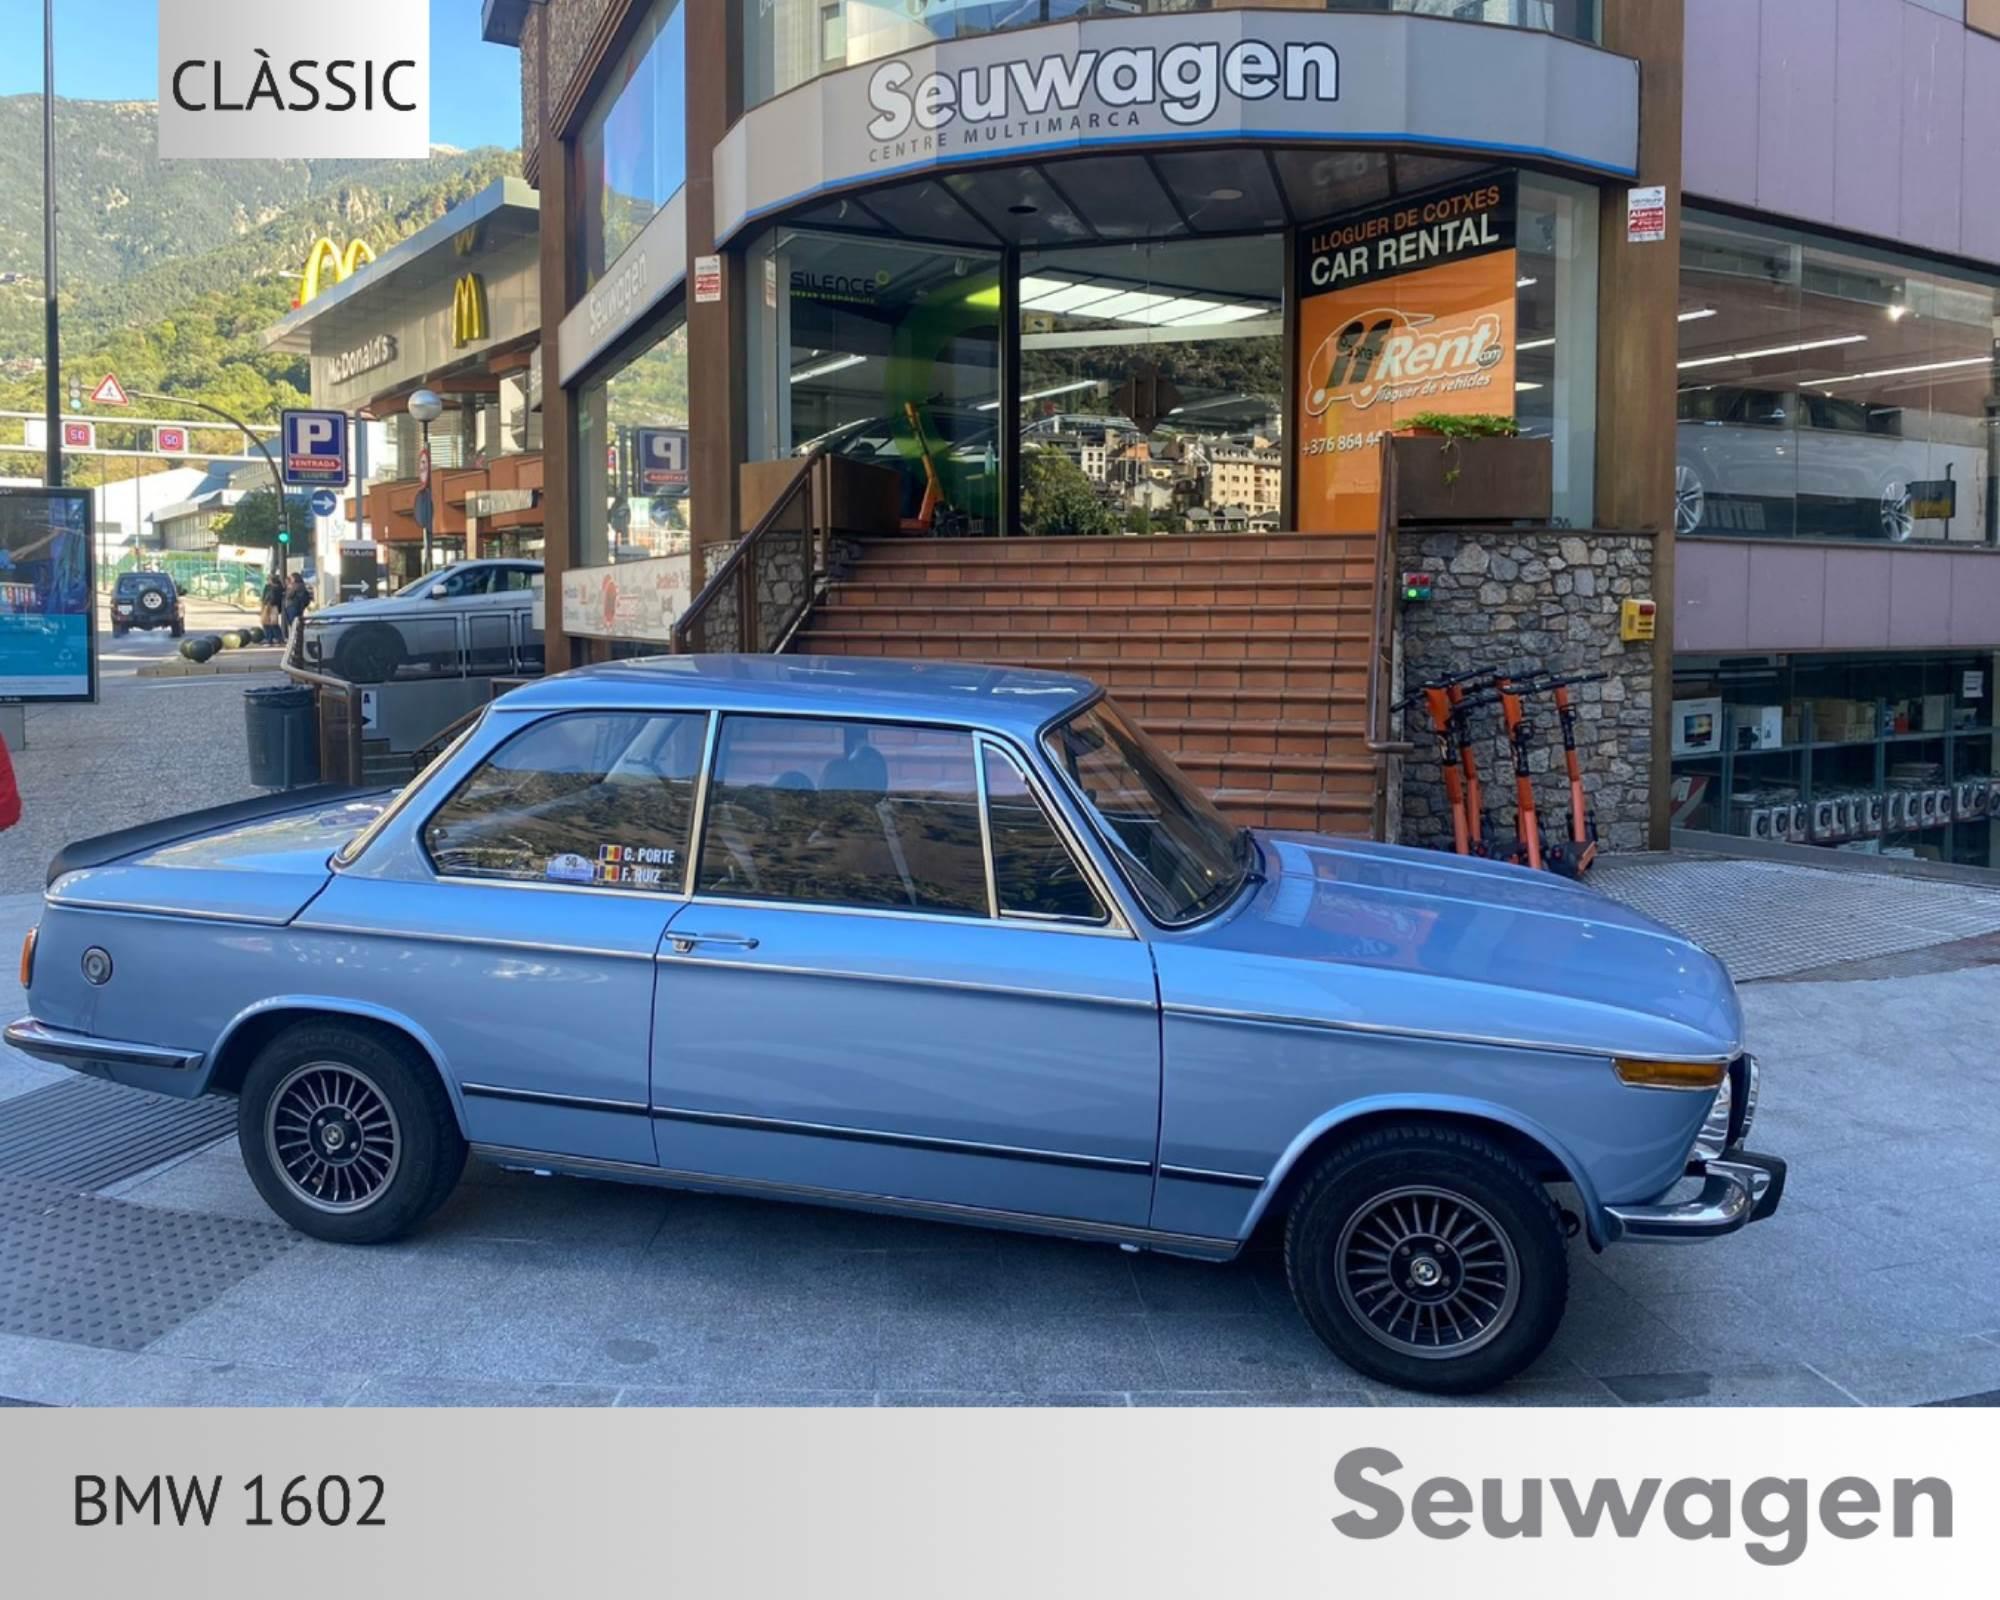 BMW - 1602 - 1602 1602 Benzina  1971  00 Km